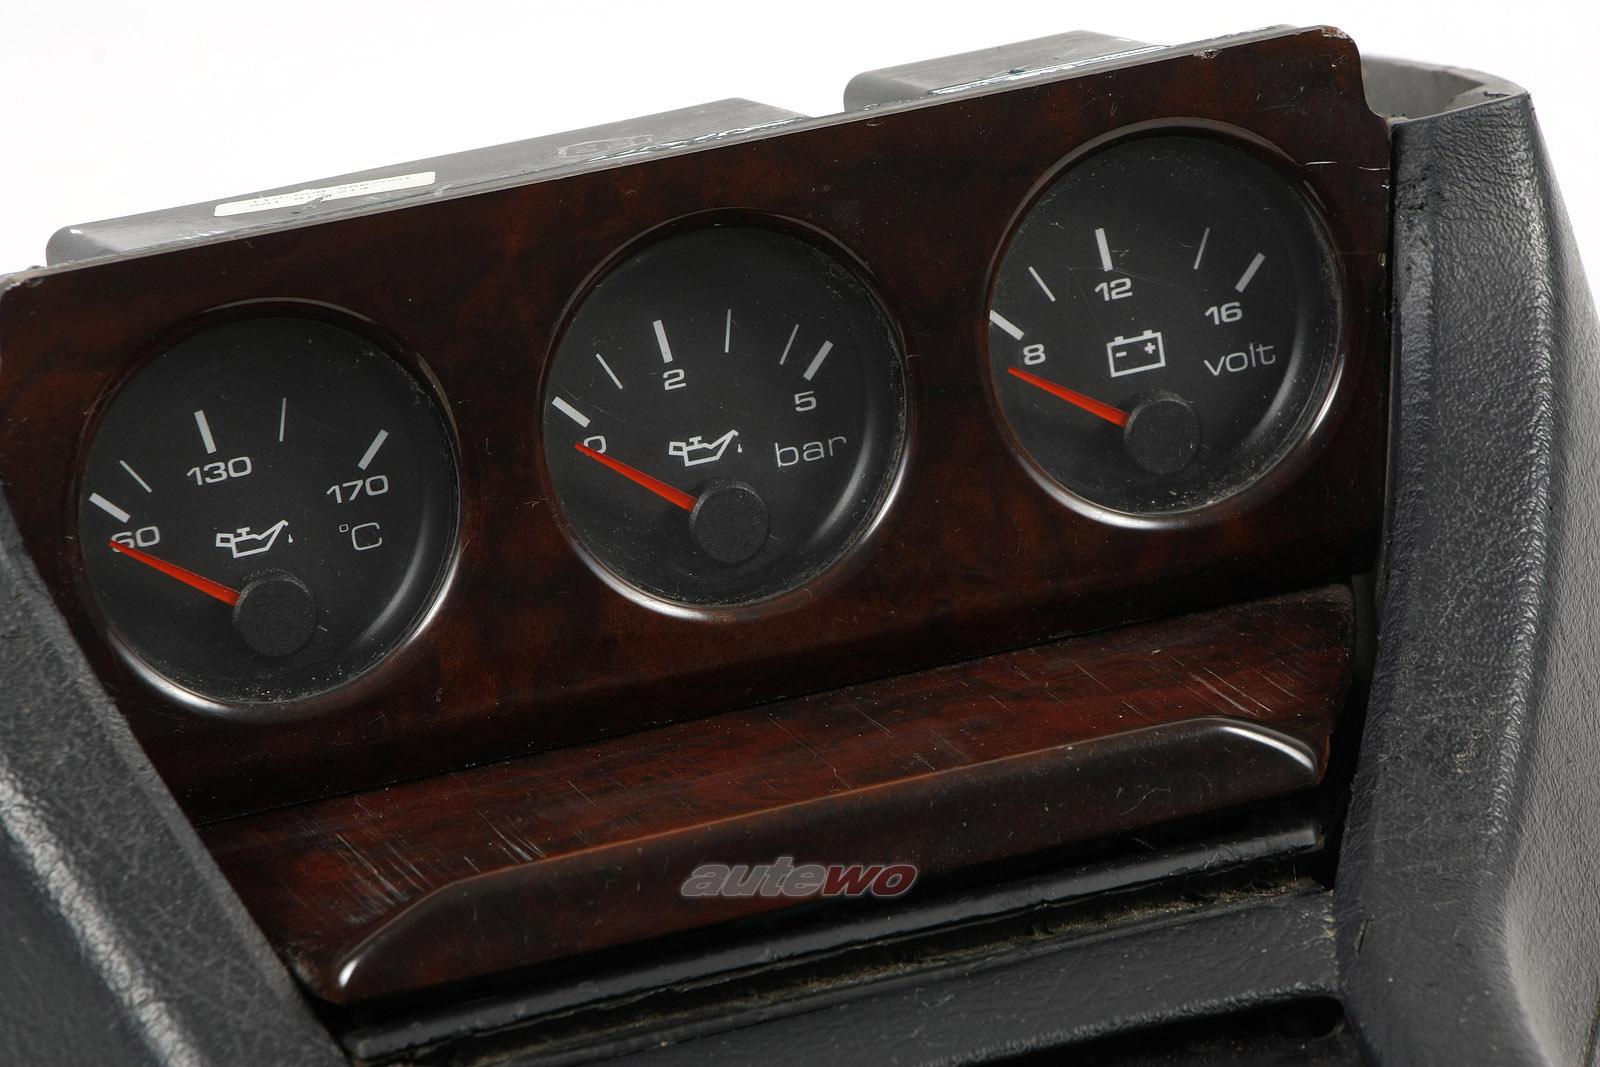 8a1919214c audi 80 b4 coupe cabrio typ 89 konsole. Black Bedroom Furniture Sets. Home Design Ideas